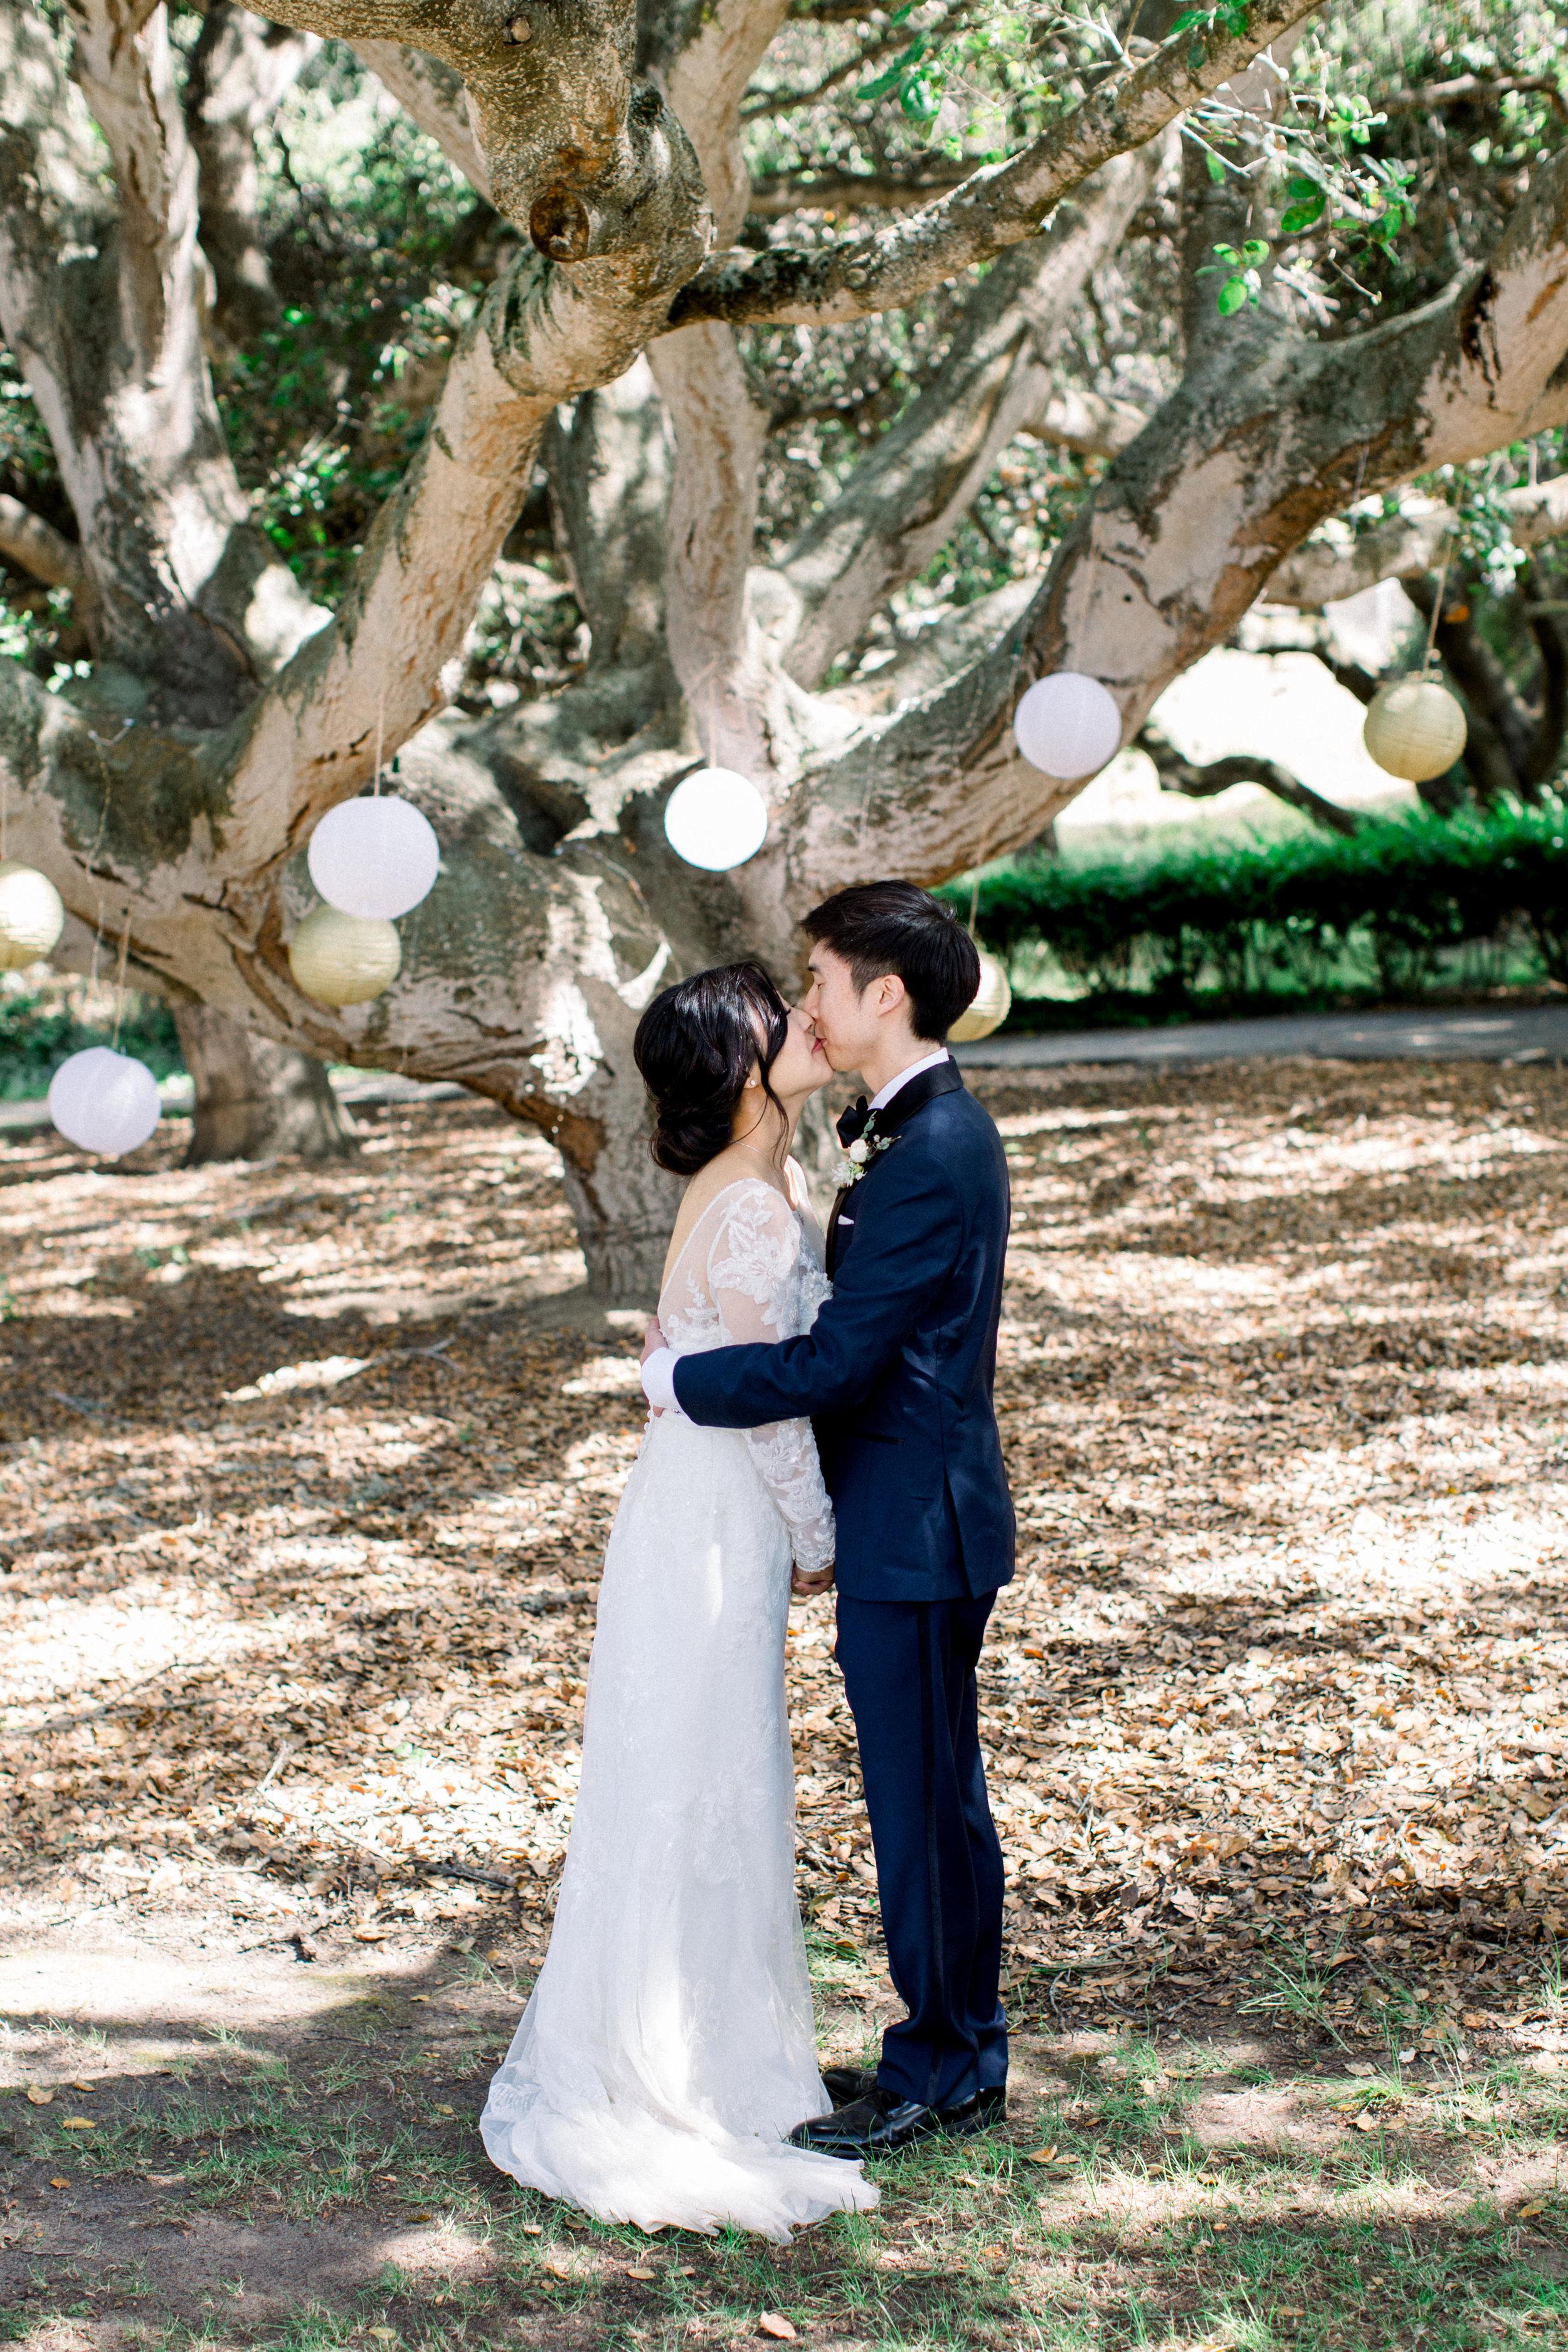 Cliffside-Carmel-valley-wedding-by-kristine-herman-photography-14.jpg